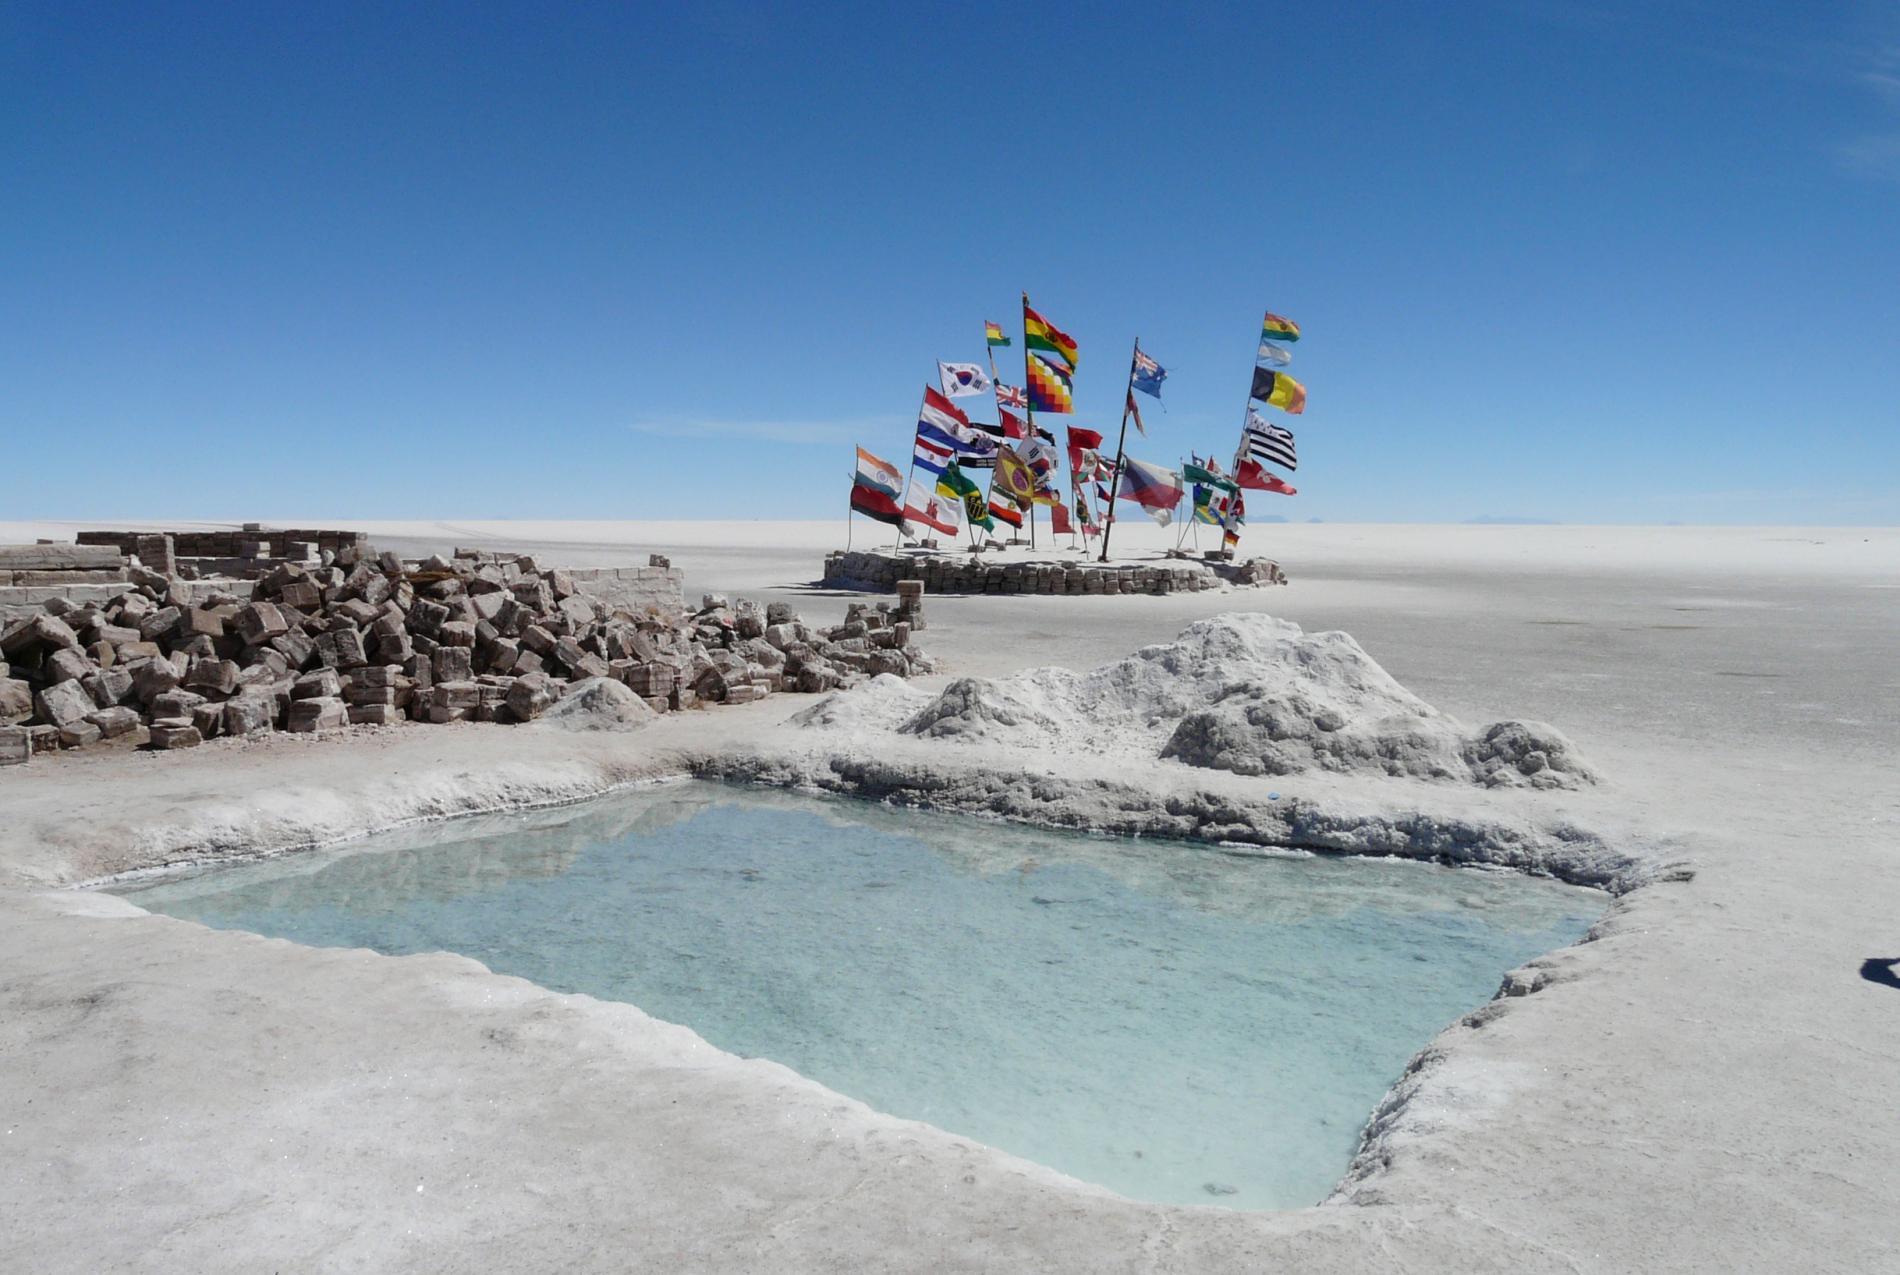 Voyage solidaire Bolivie : Vision du Monde - Photo 3